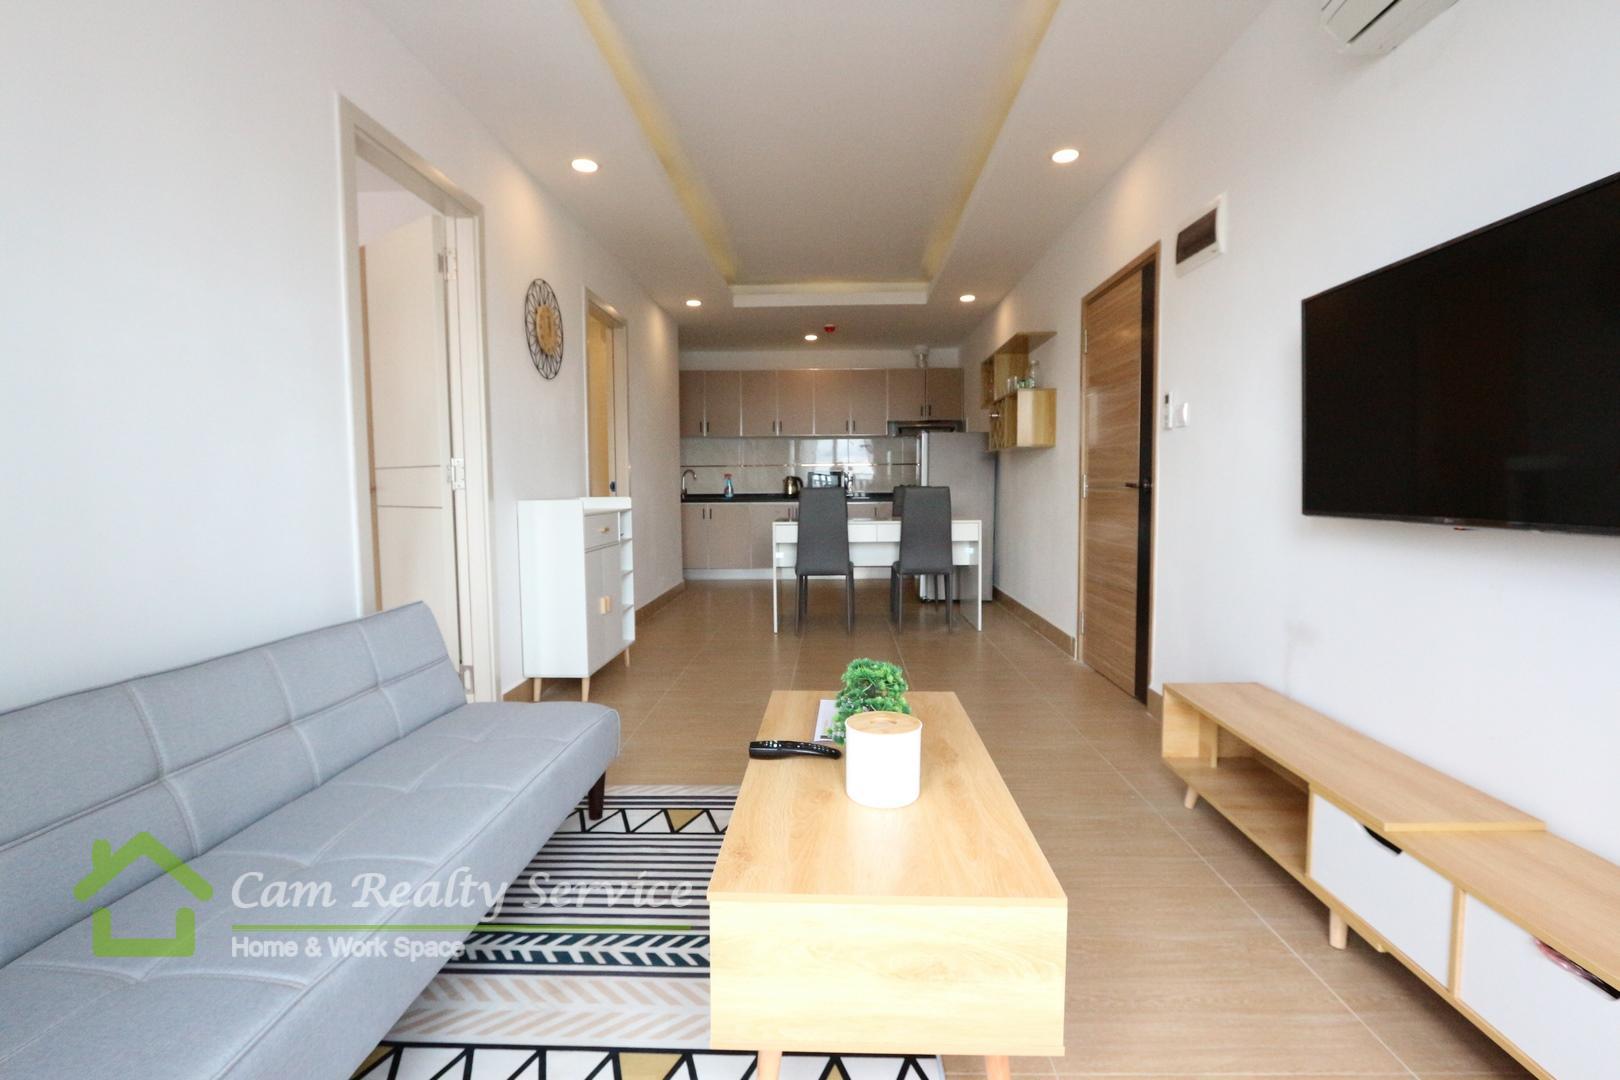 Beong Trabek area  Modern style 2 bedrooms 2 bathrooms service condominium for rent 11st floor  700$/month In Convenient & Quiet area